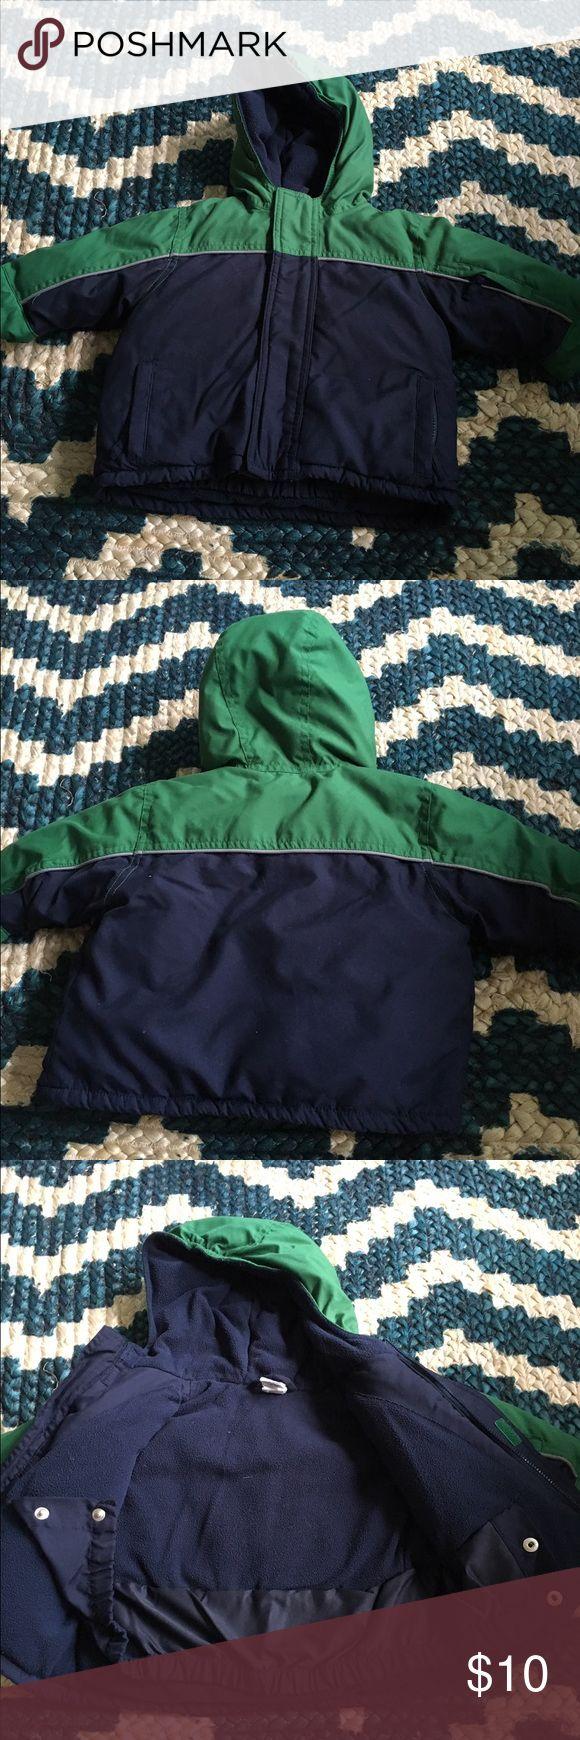 Baby Gap coat Gap 3-6 month winter coat in good condition. GAP Jackets & Coats Puffers